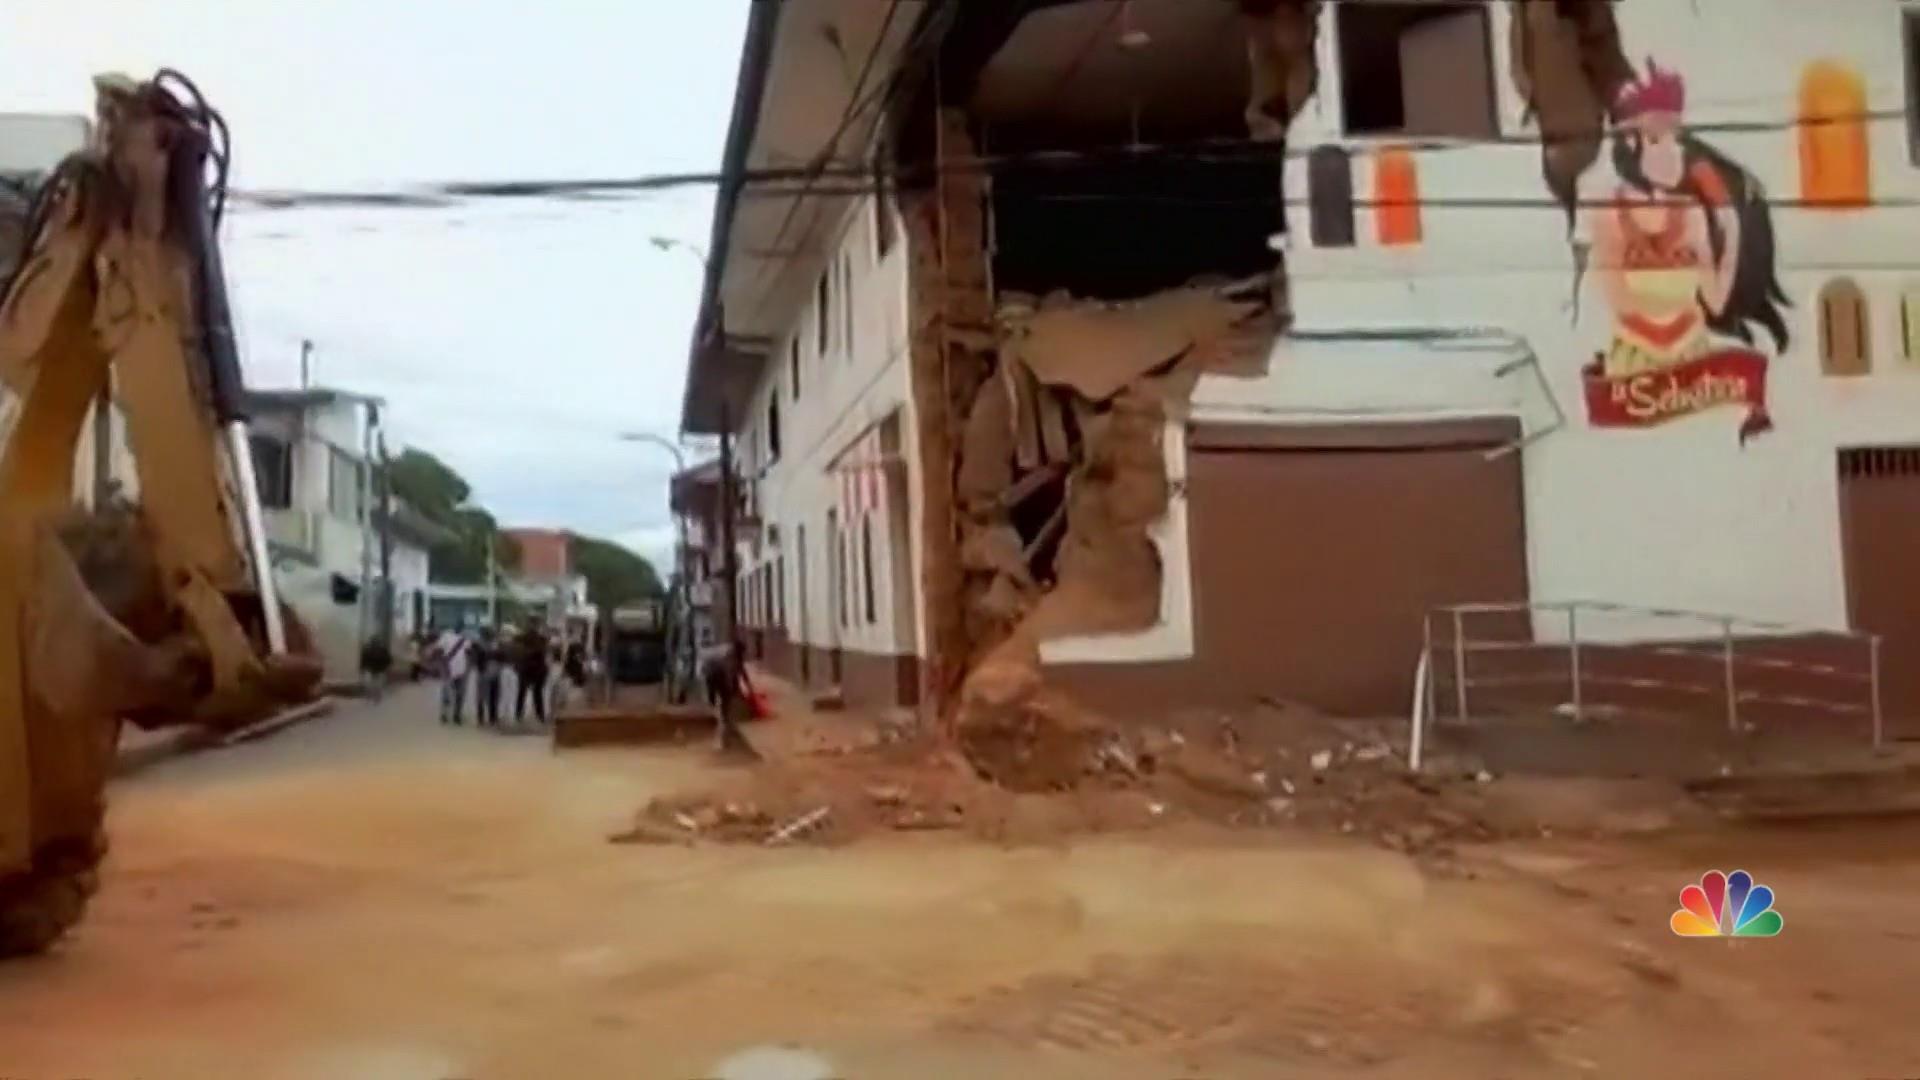 peru earthquake - photo #21